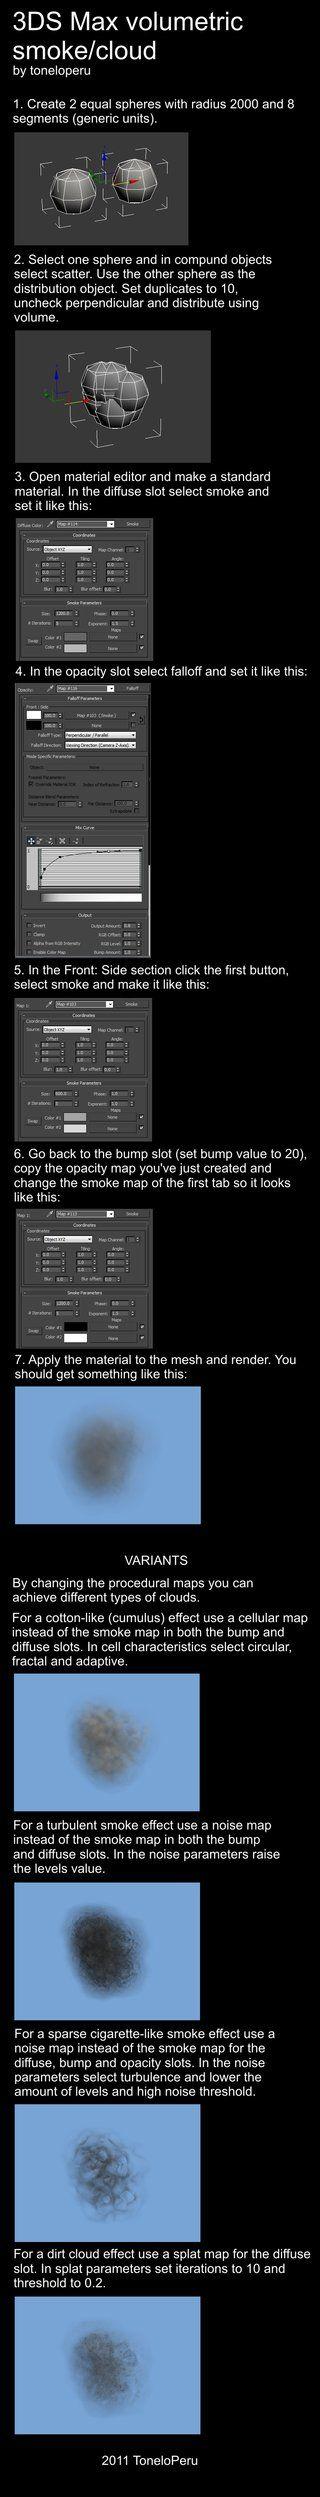 3ds max smoke tutorial by toneloperu